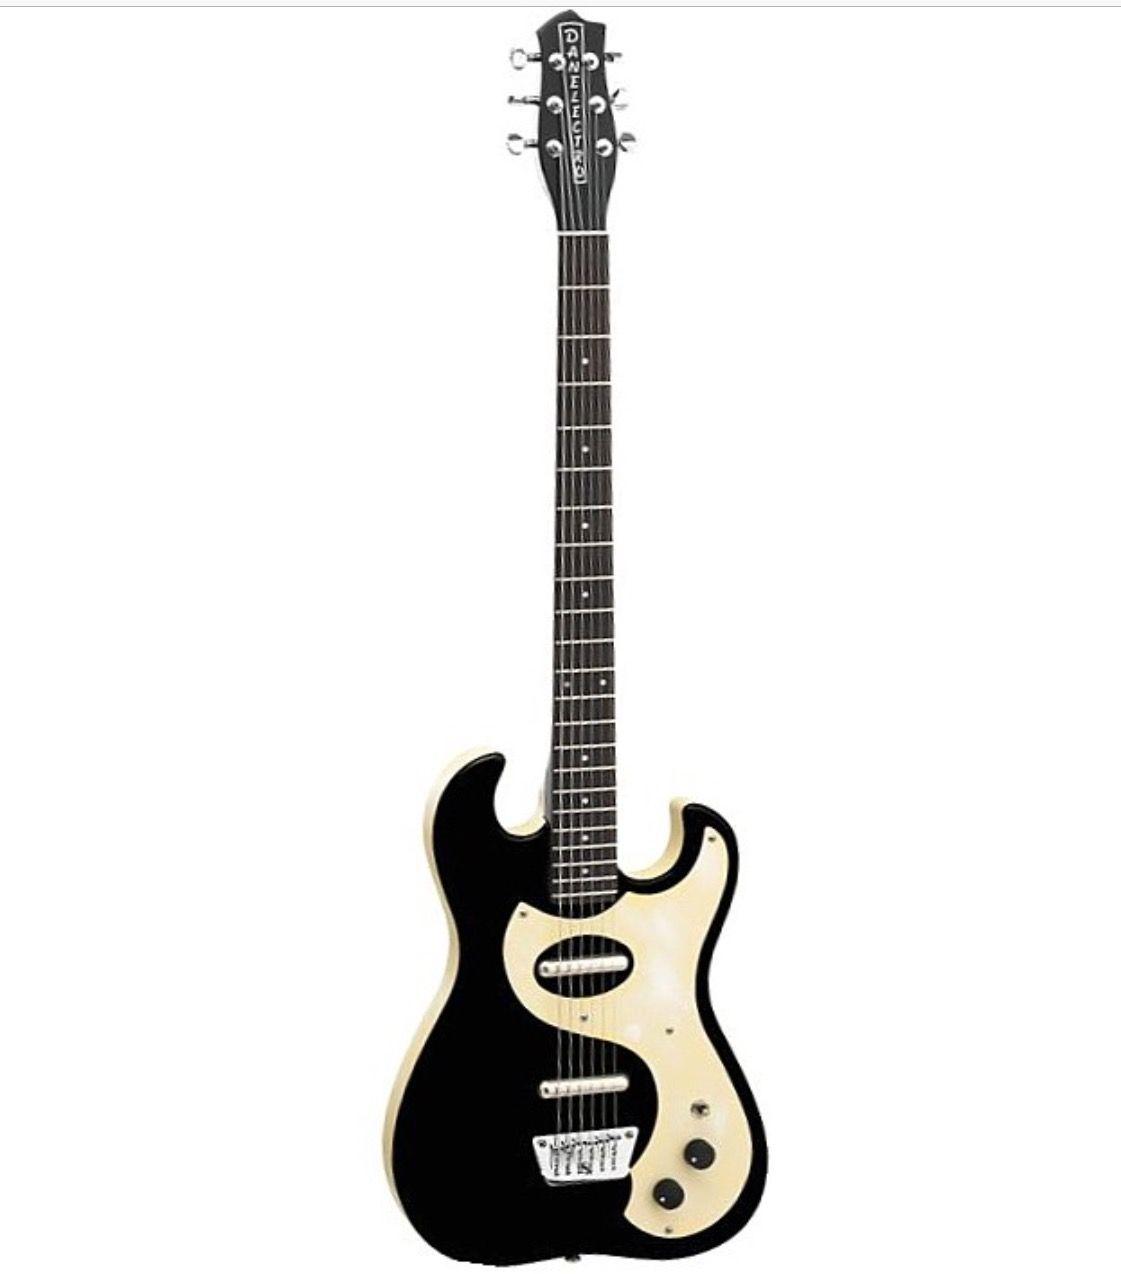 Danelectro | Baritone guitar, Guitar, Baritone